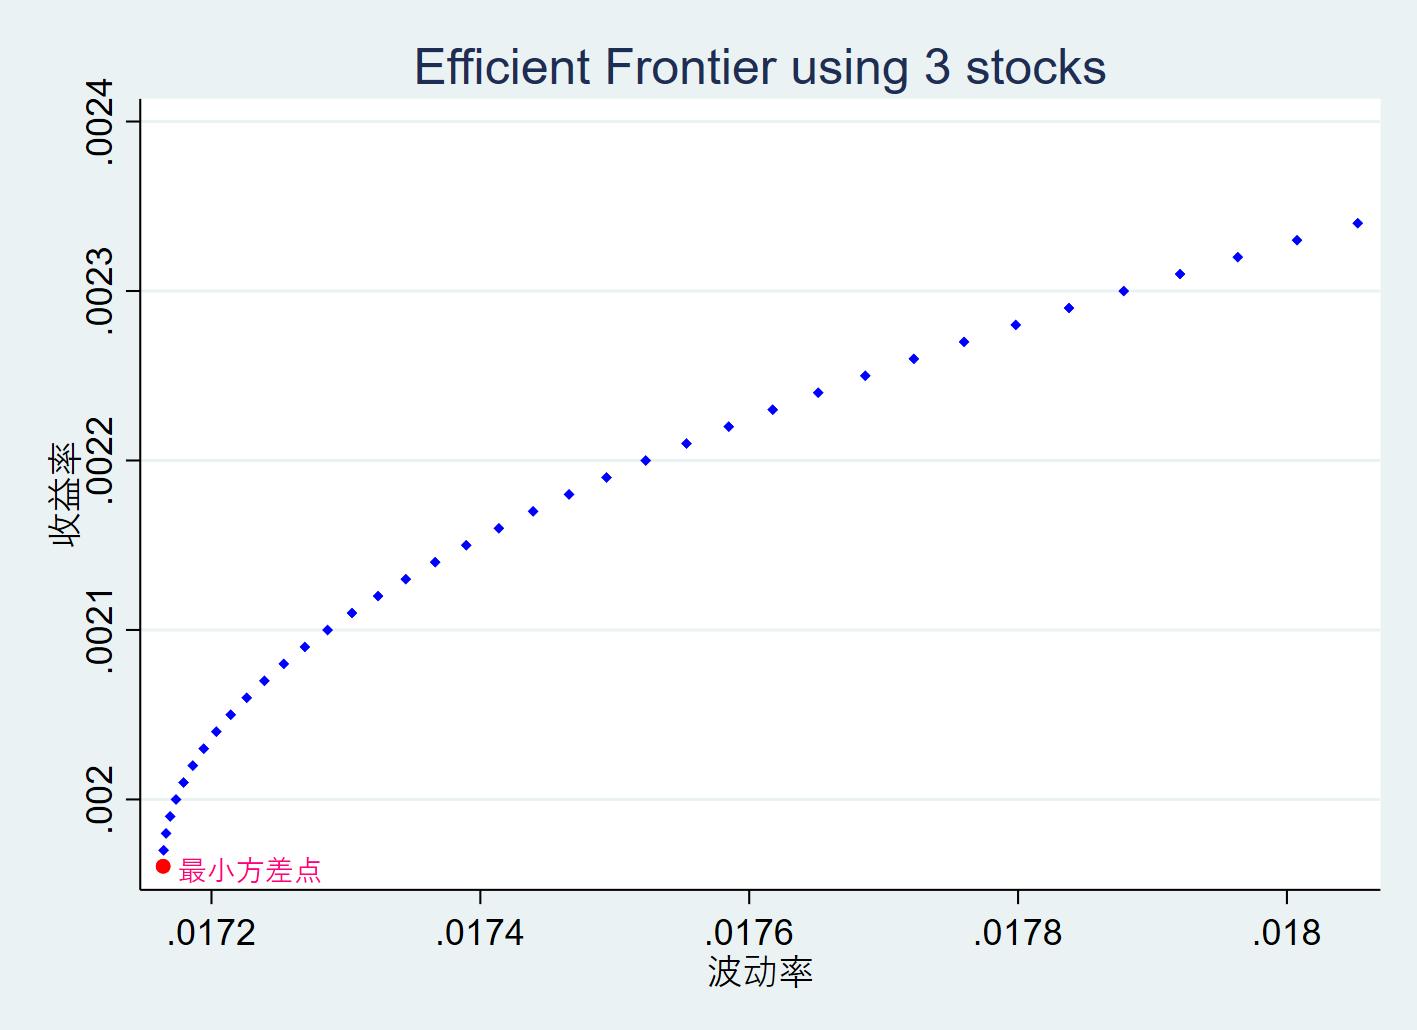 Efficient Frontier using 3 stocks